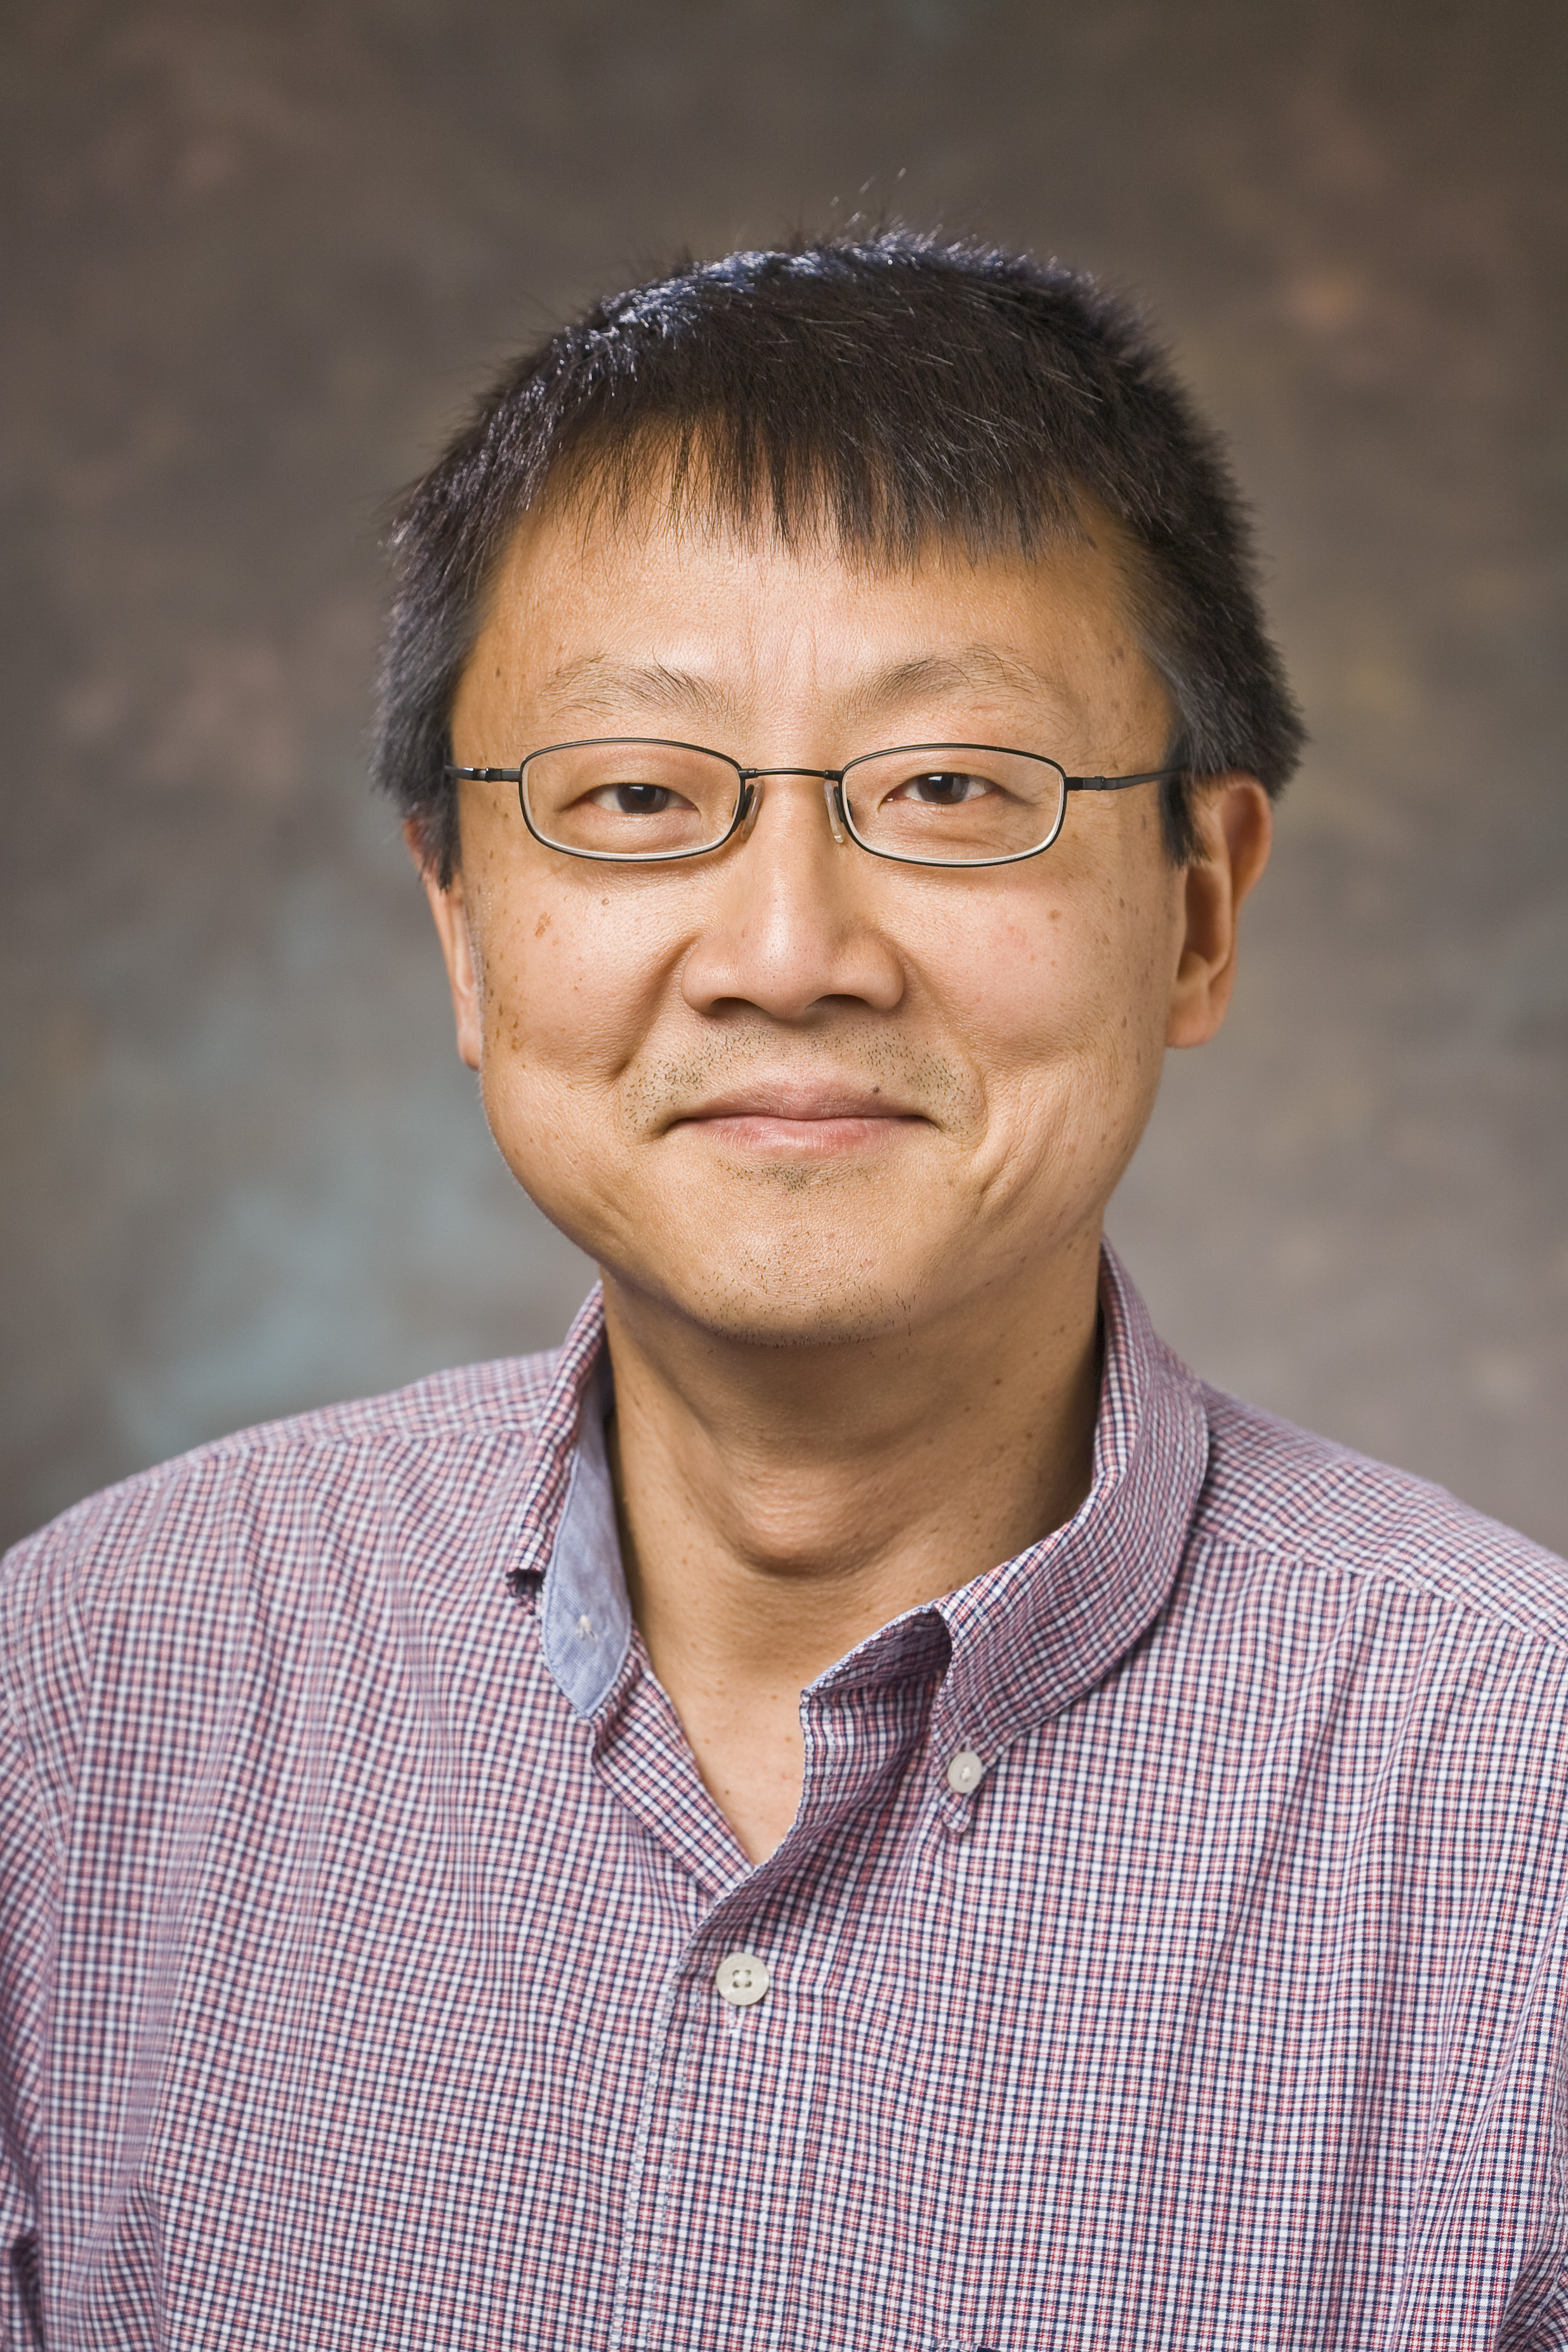 Patrick Sung, PhD.